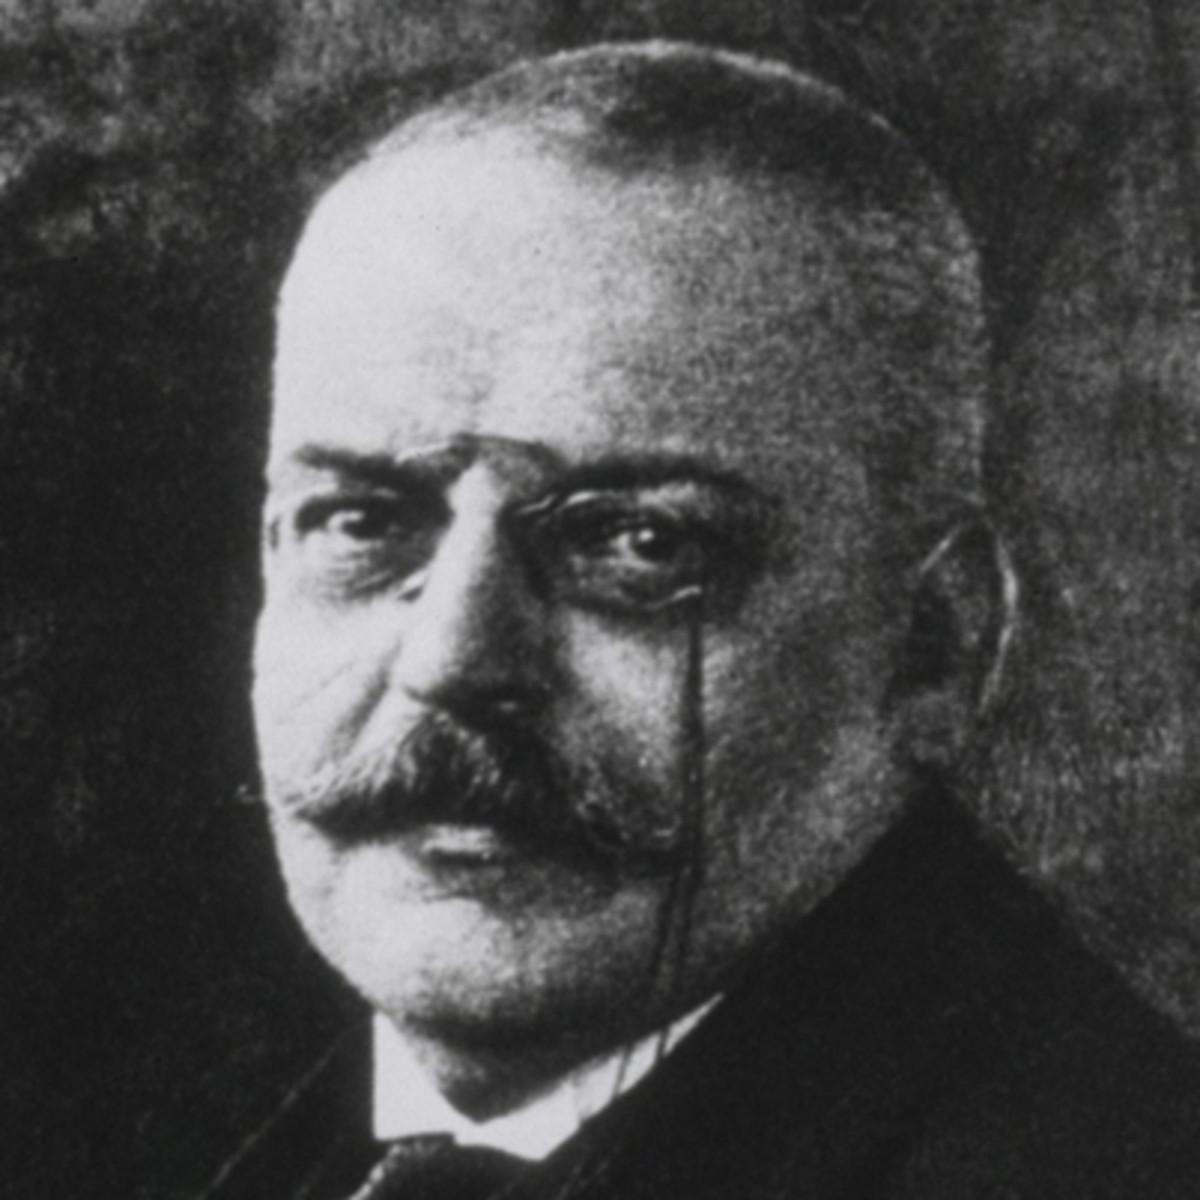 Povestea psihiatrului Alois Alzheimer